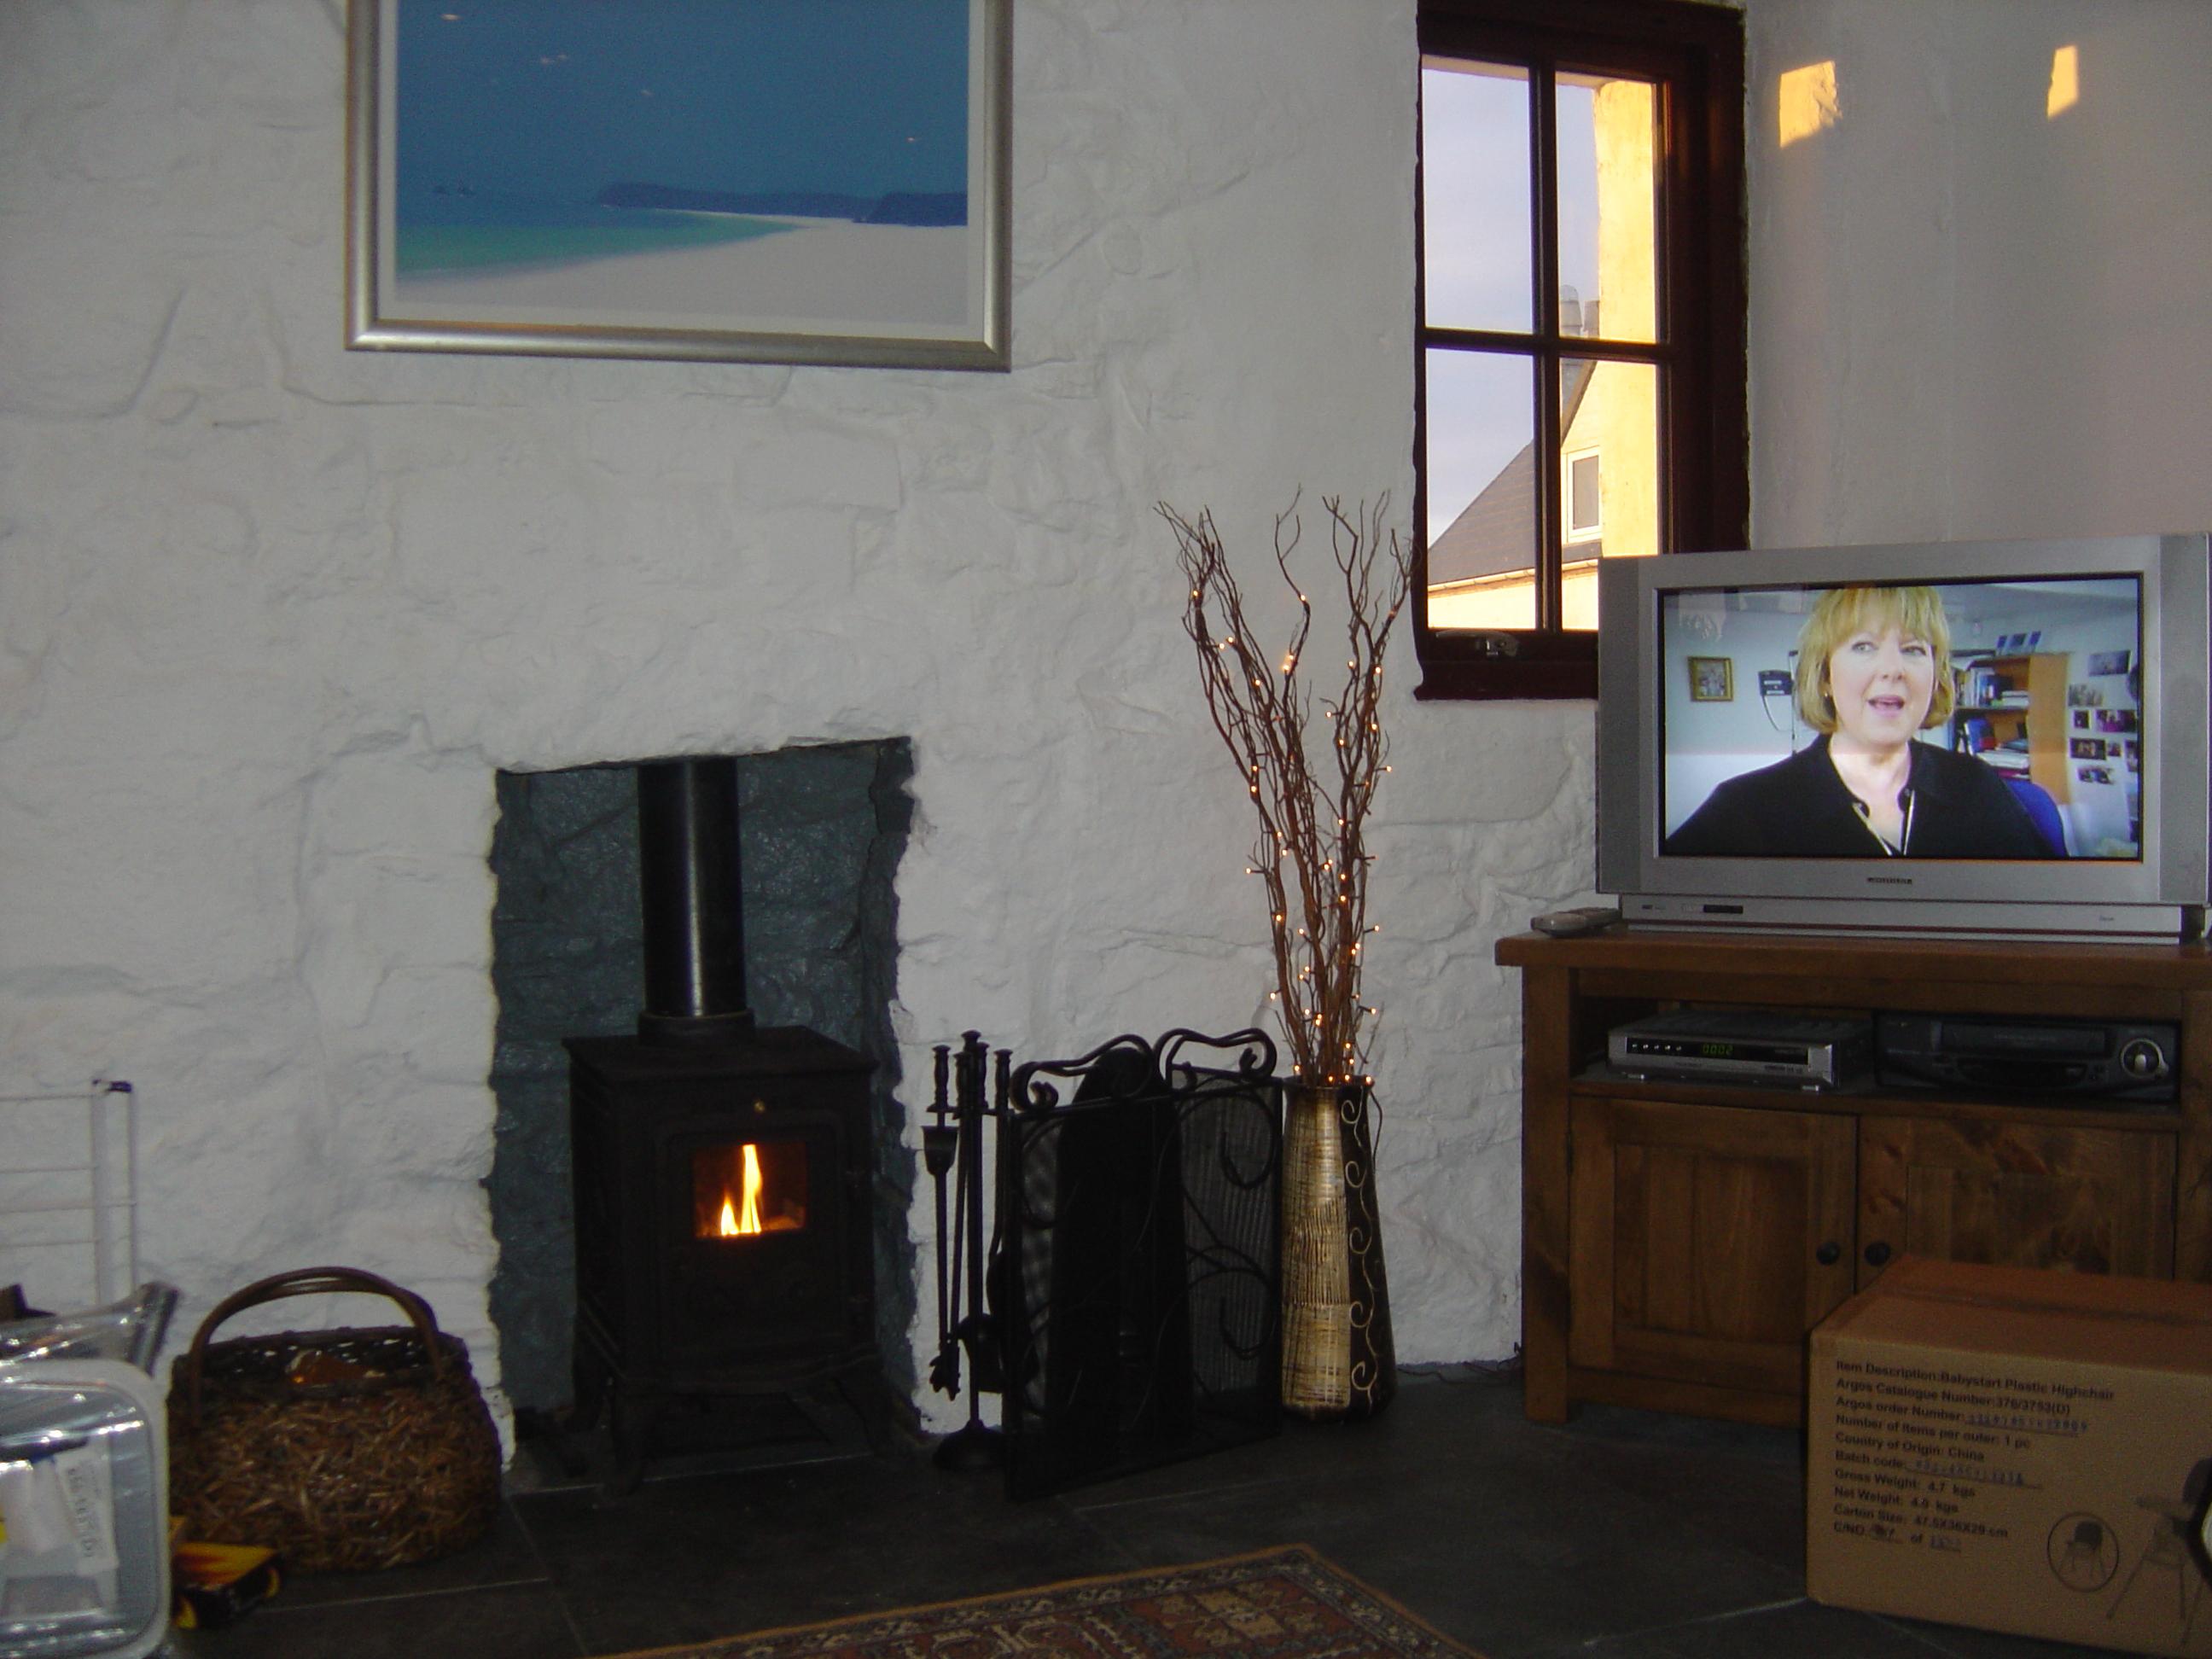 Living Room Stove gets lit!